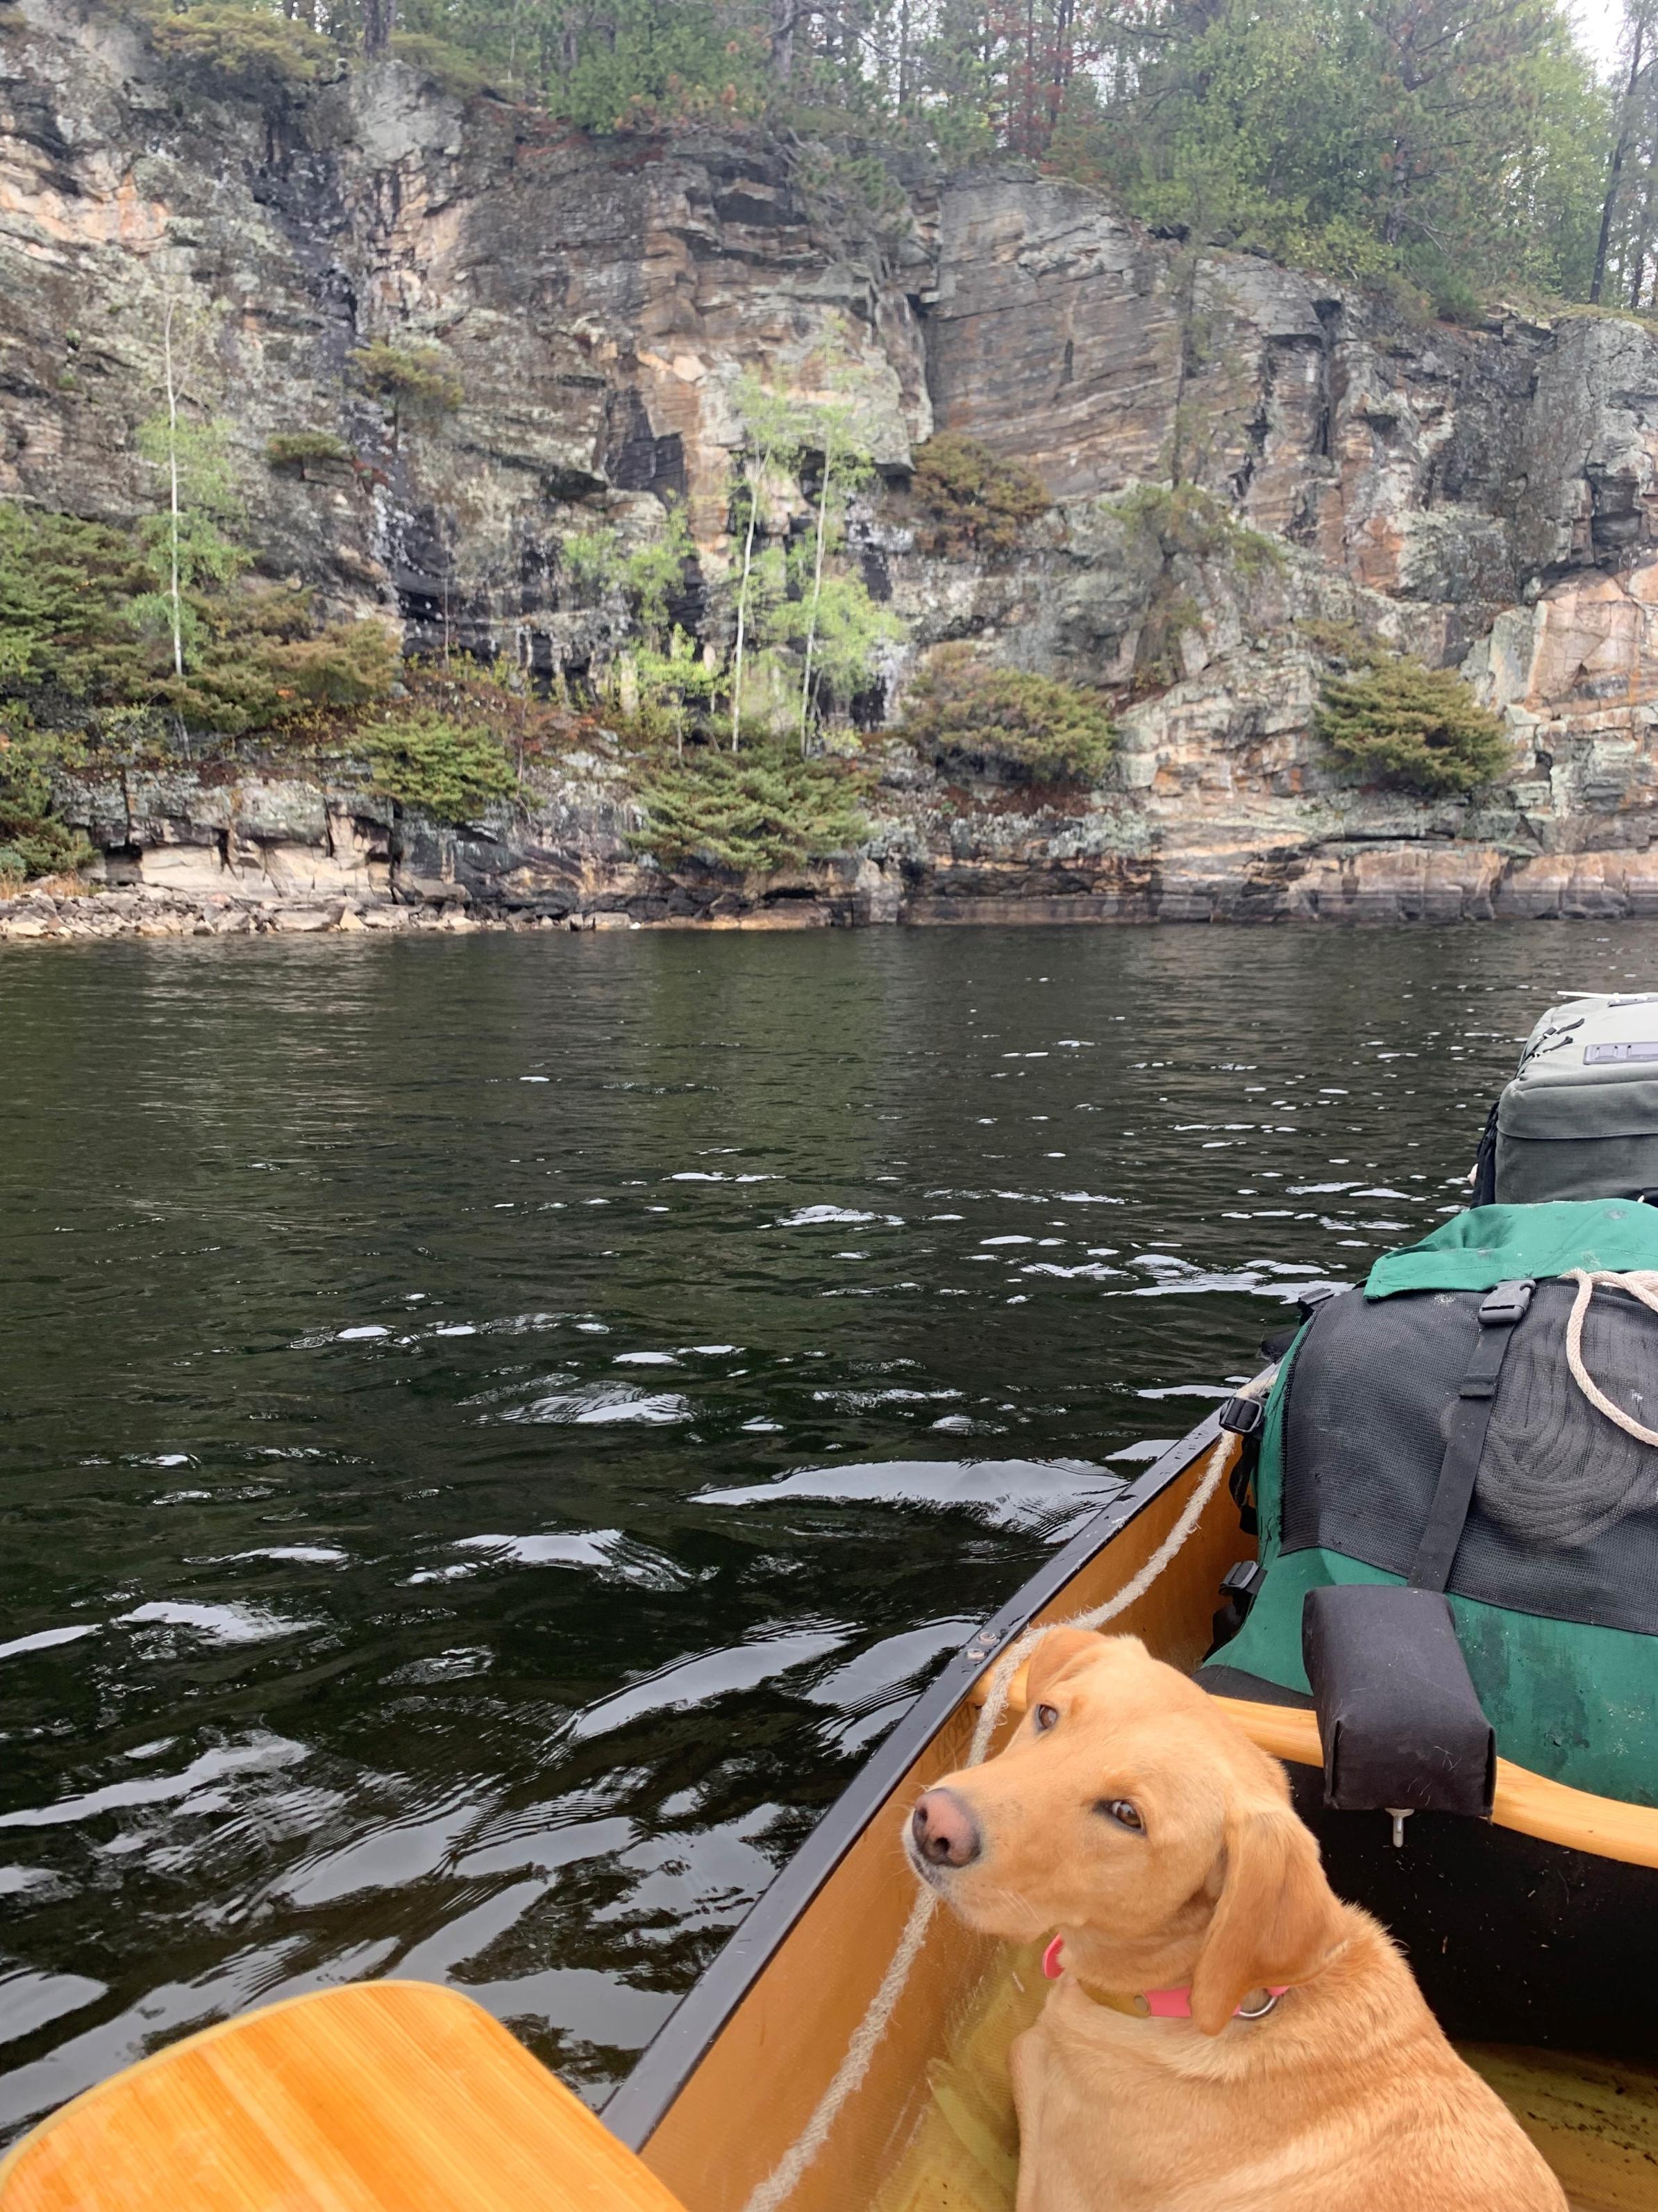 Bonnie on Quetico Lake, Oct 2021